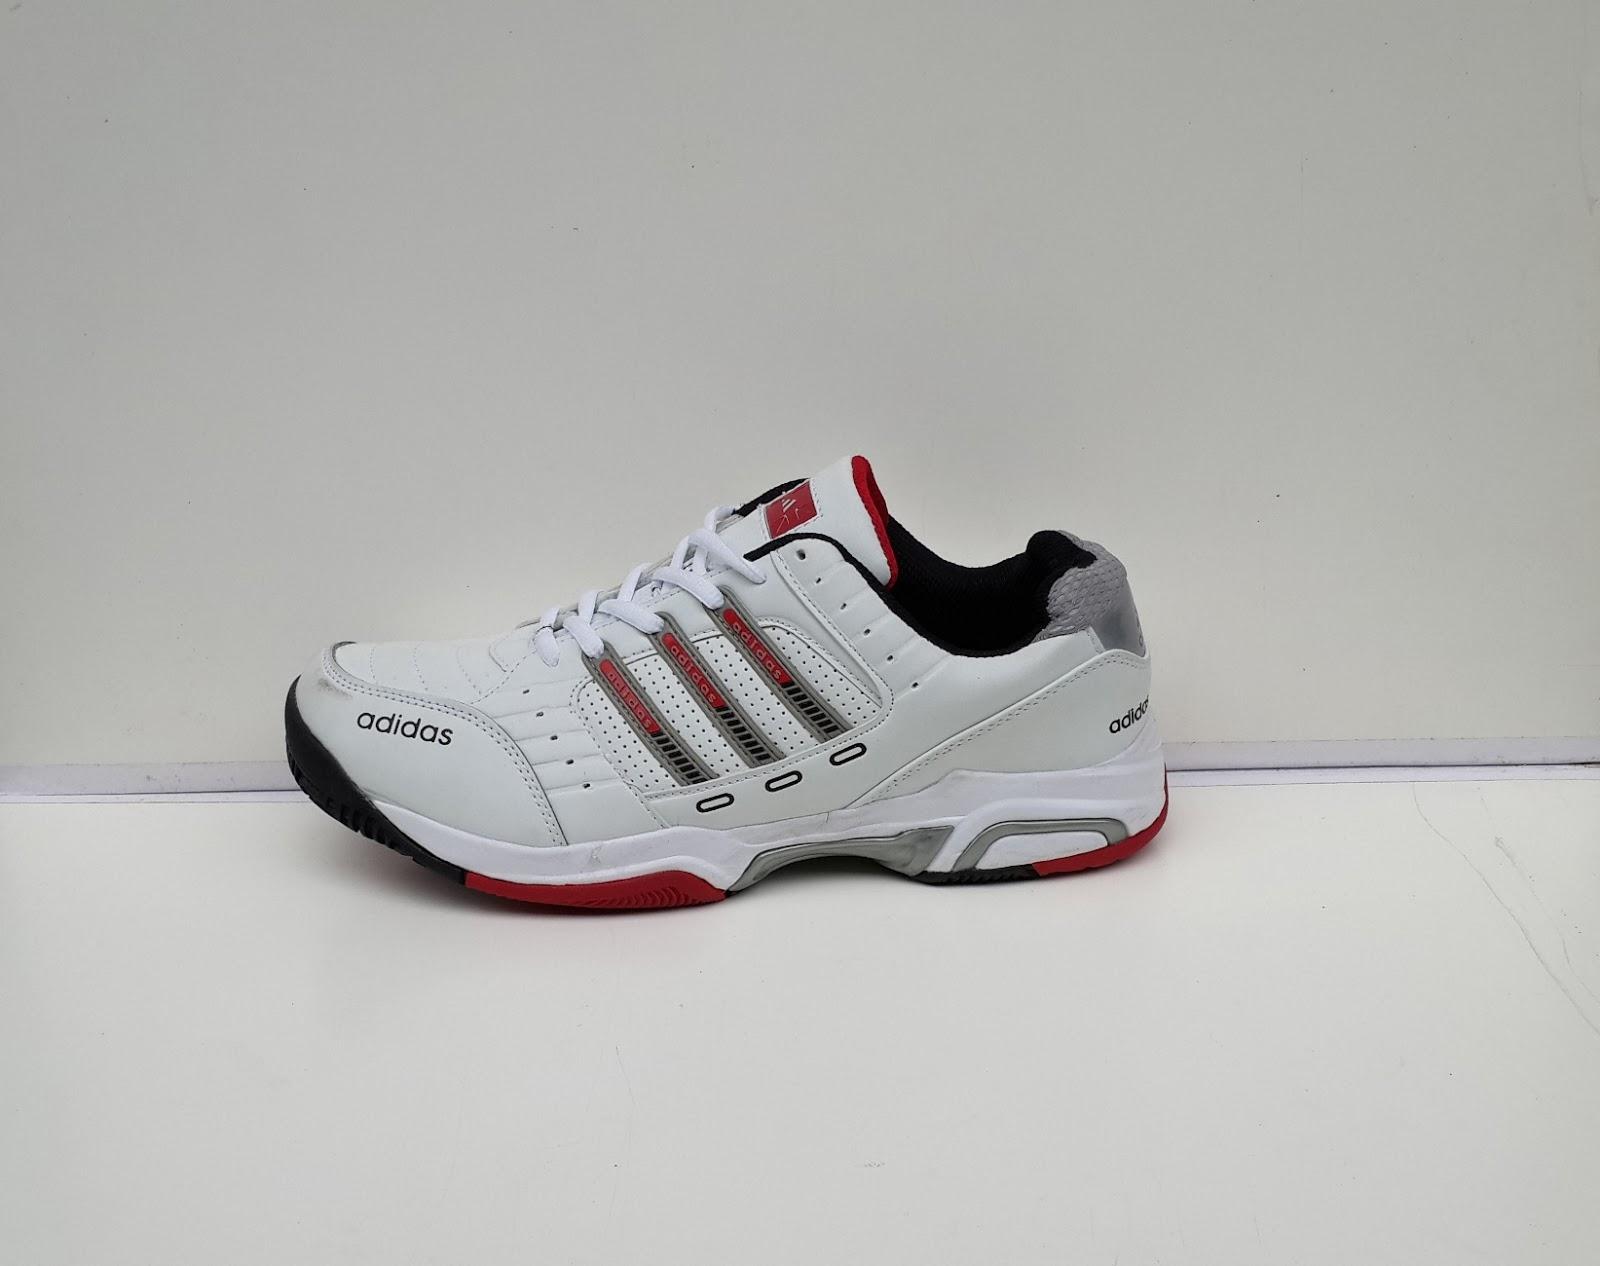 sepatu murah,adidas murah,tenis murah